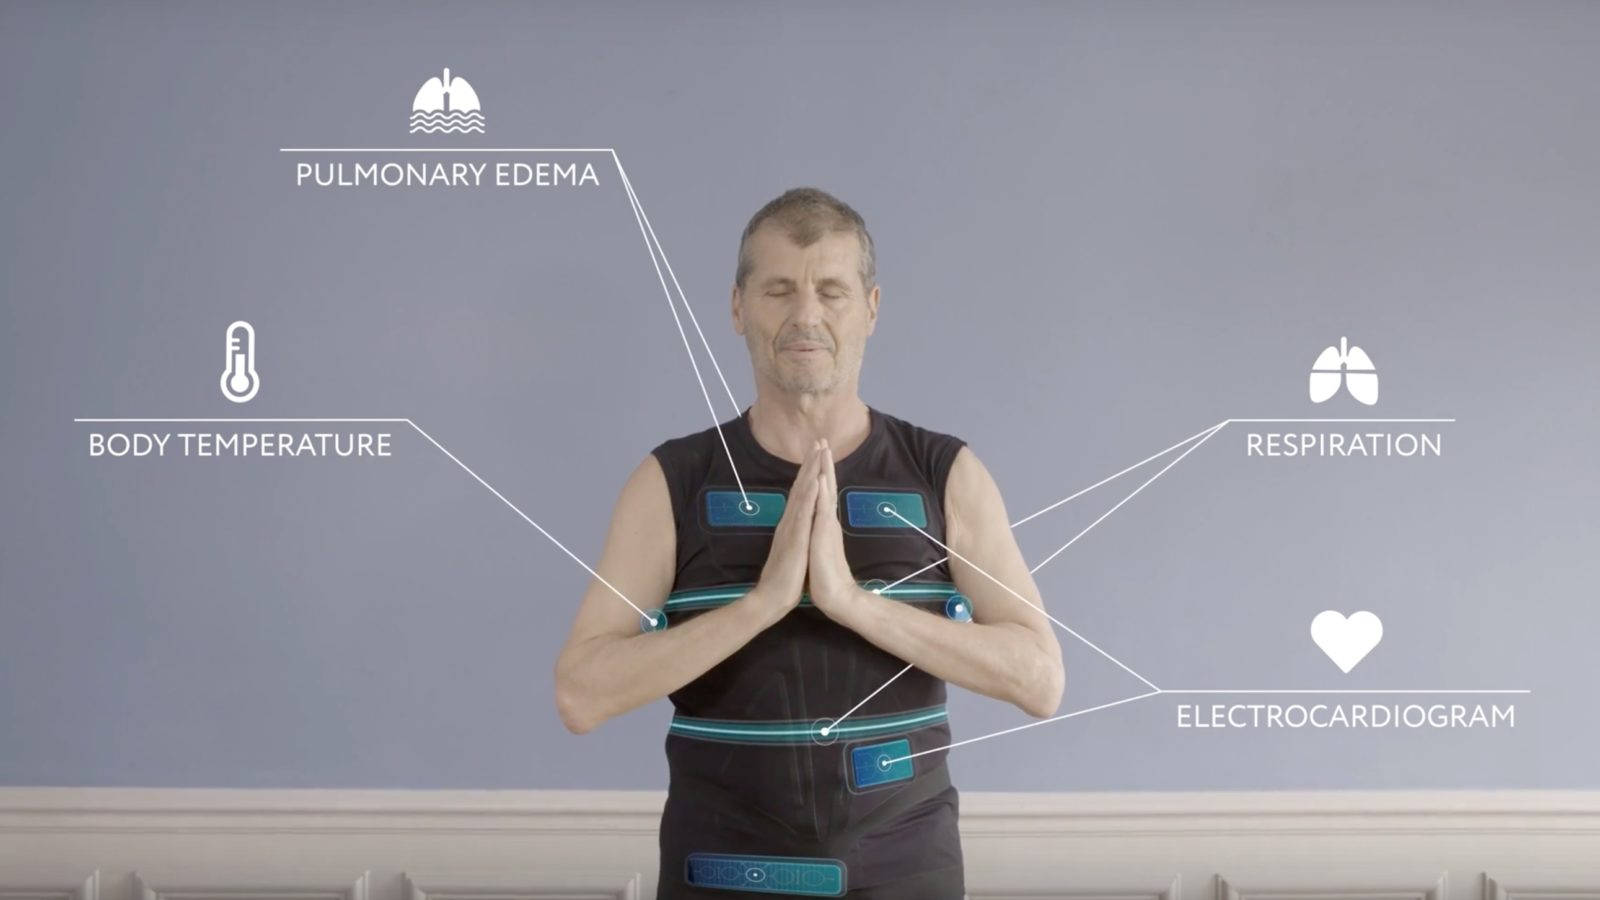 Esta camiseta conectada é capaz de monitorar seu estado de saúde para prevenir ataques cardíacos